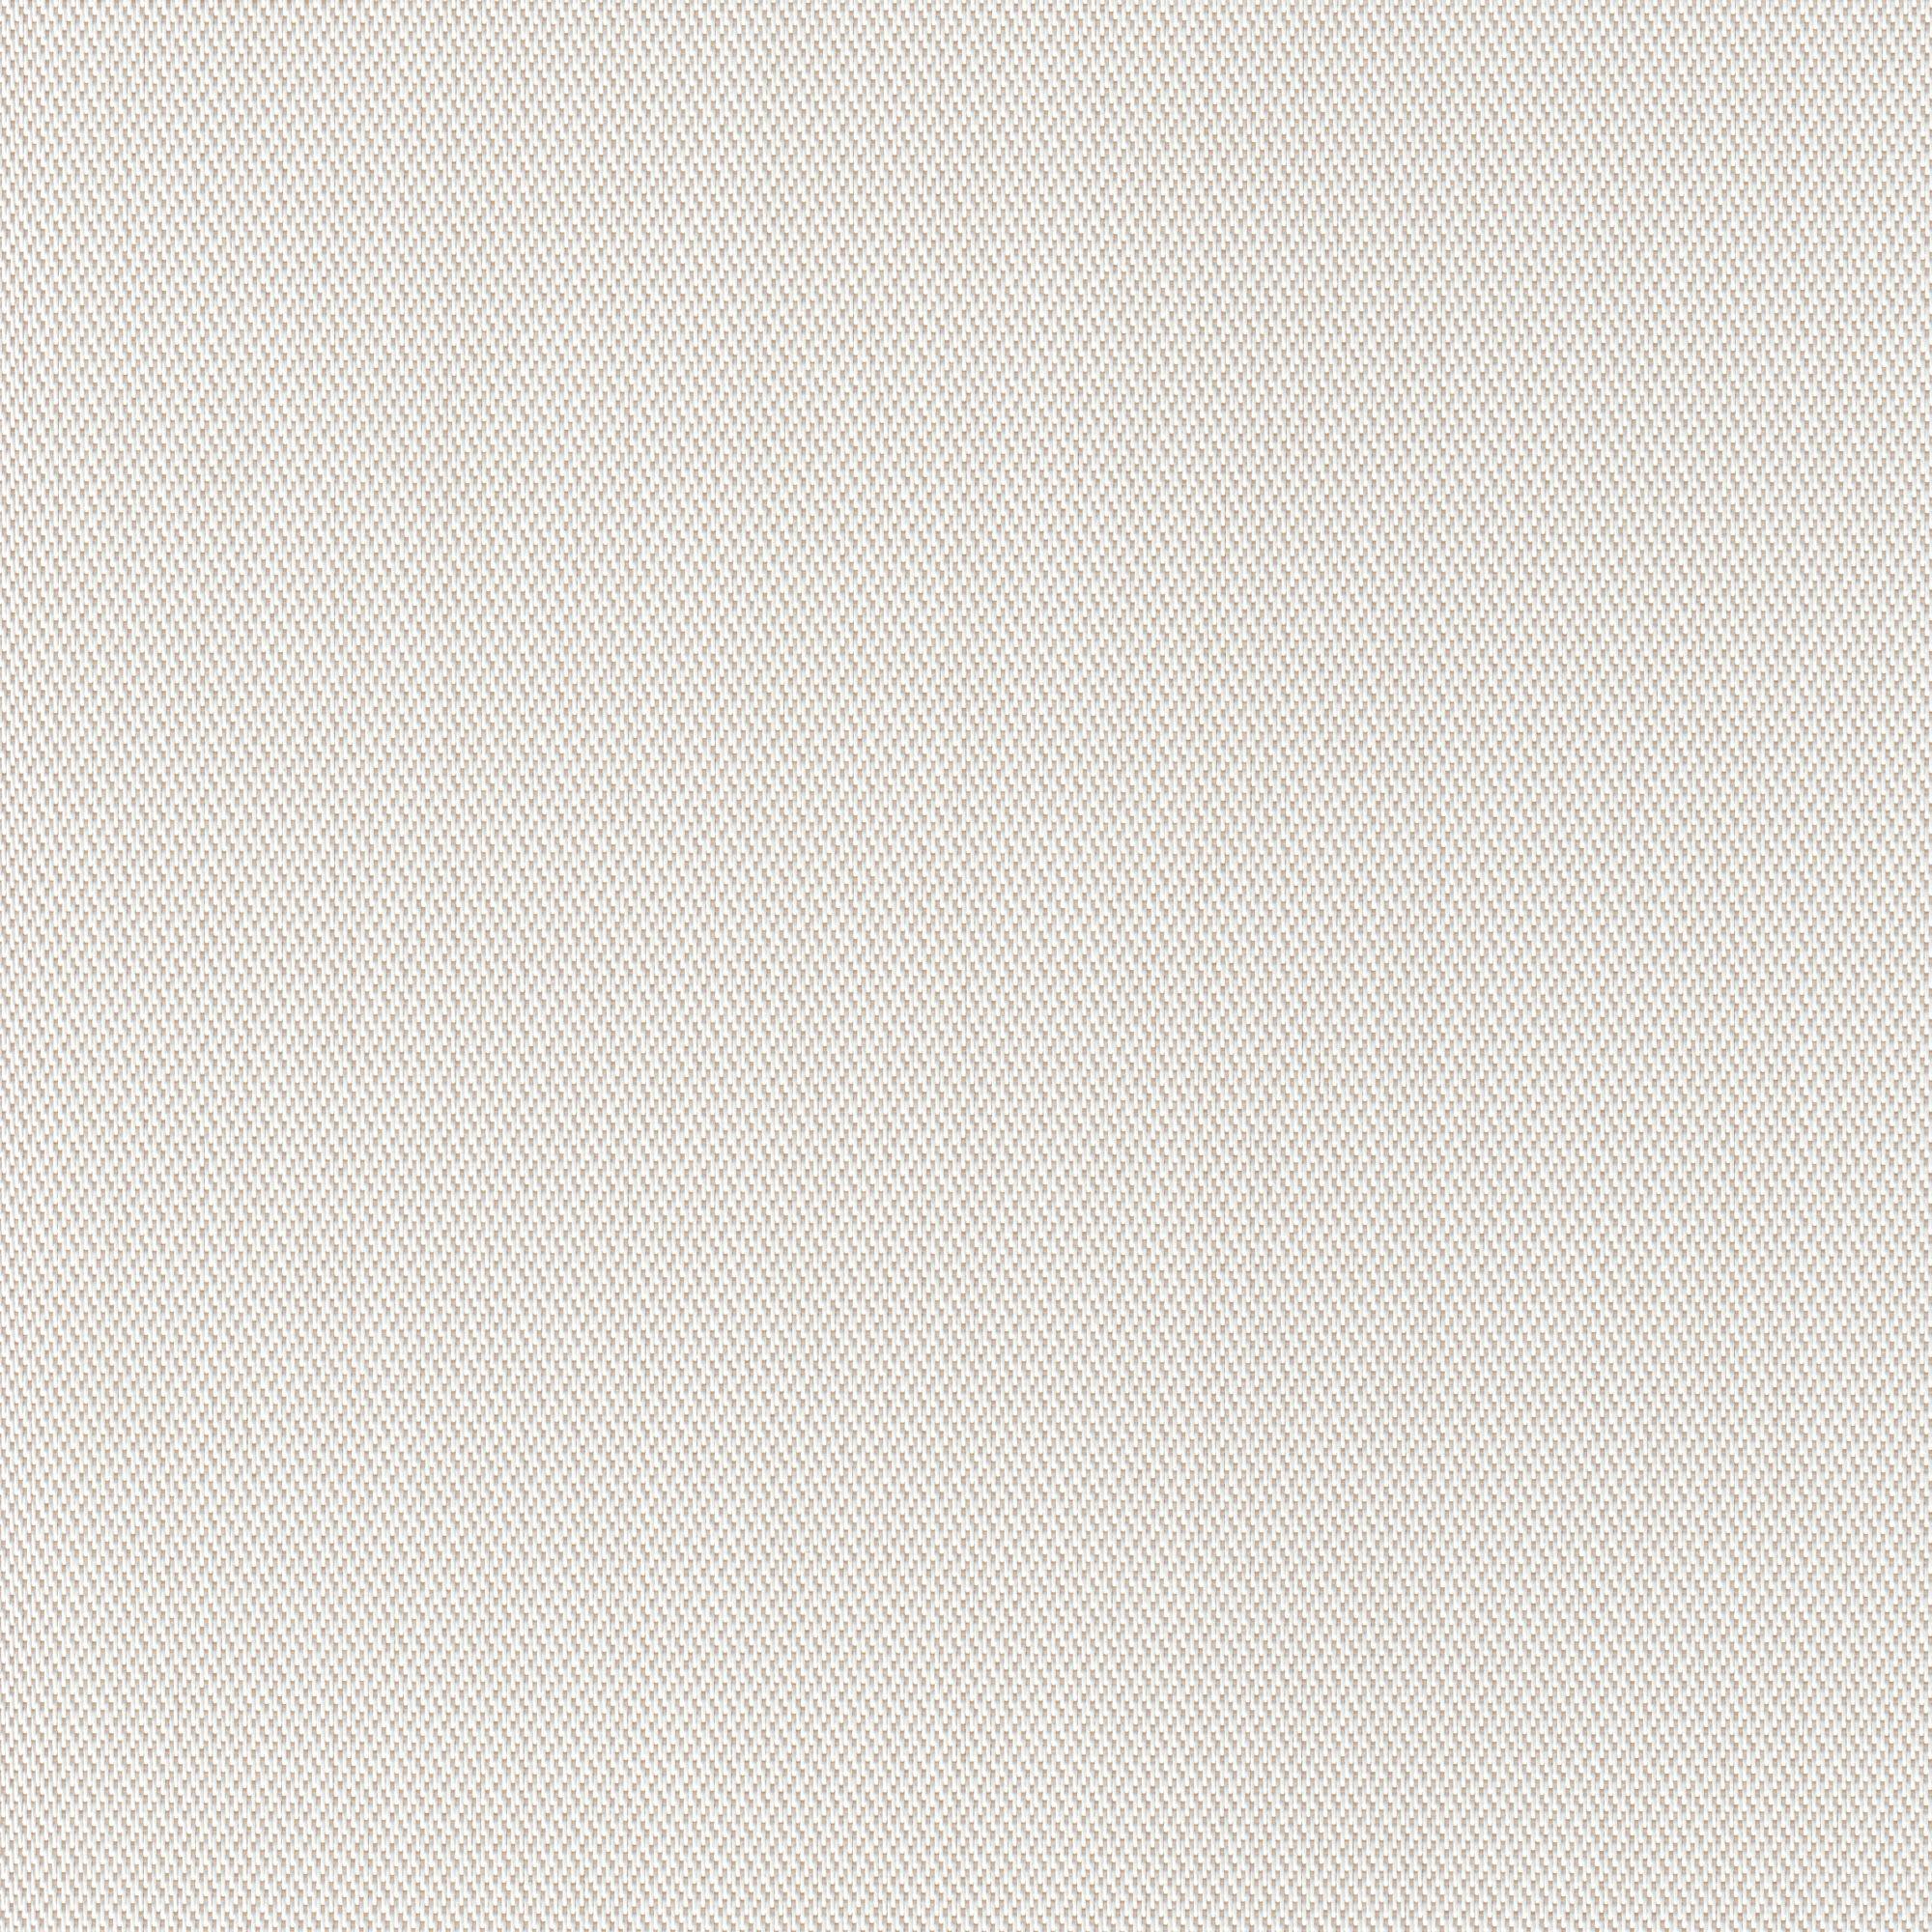 Nordic Screen Twill White-Sand